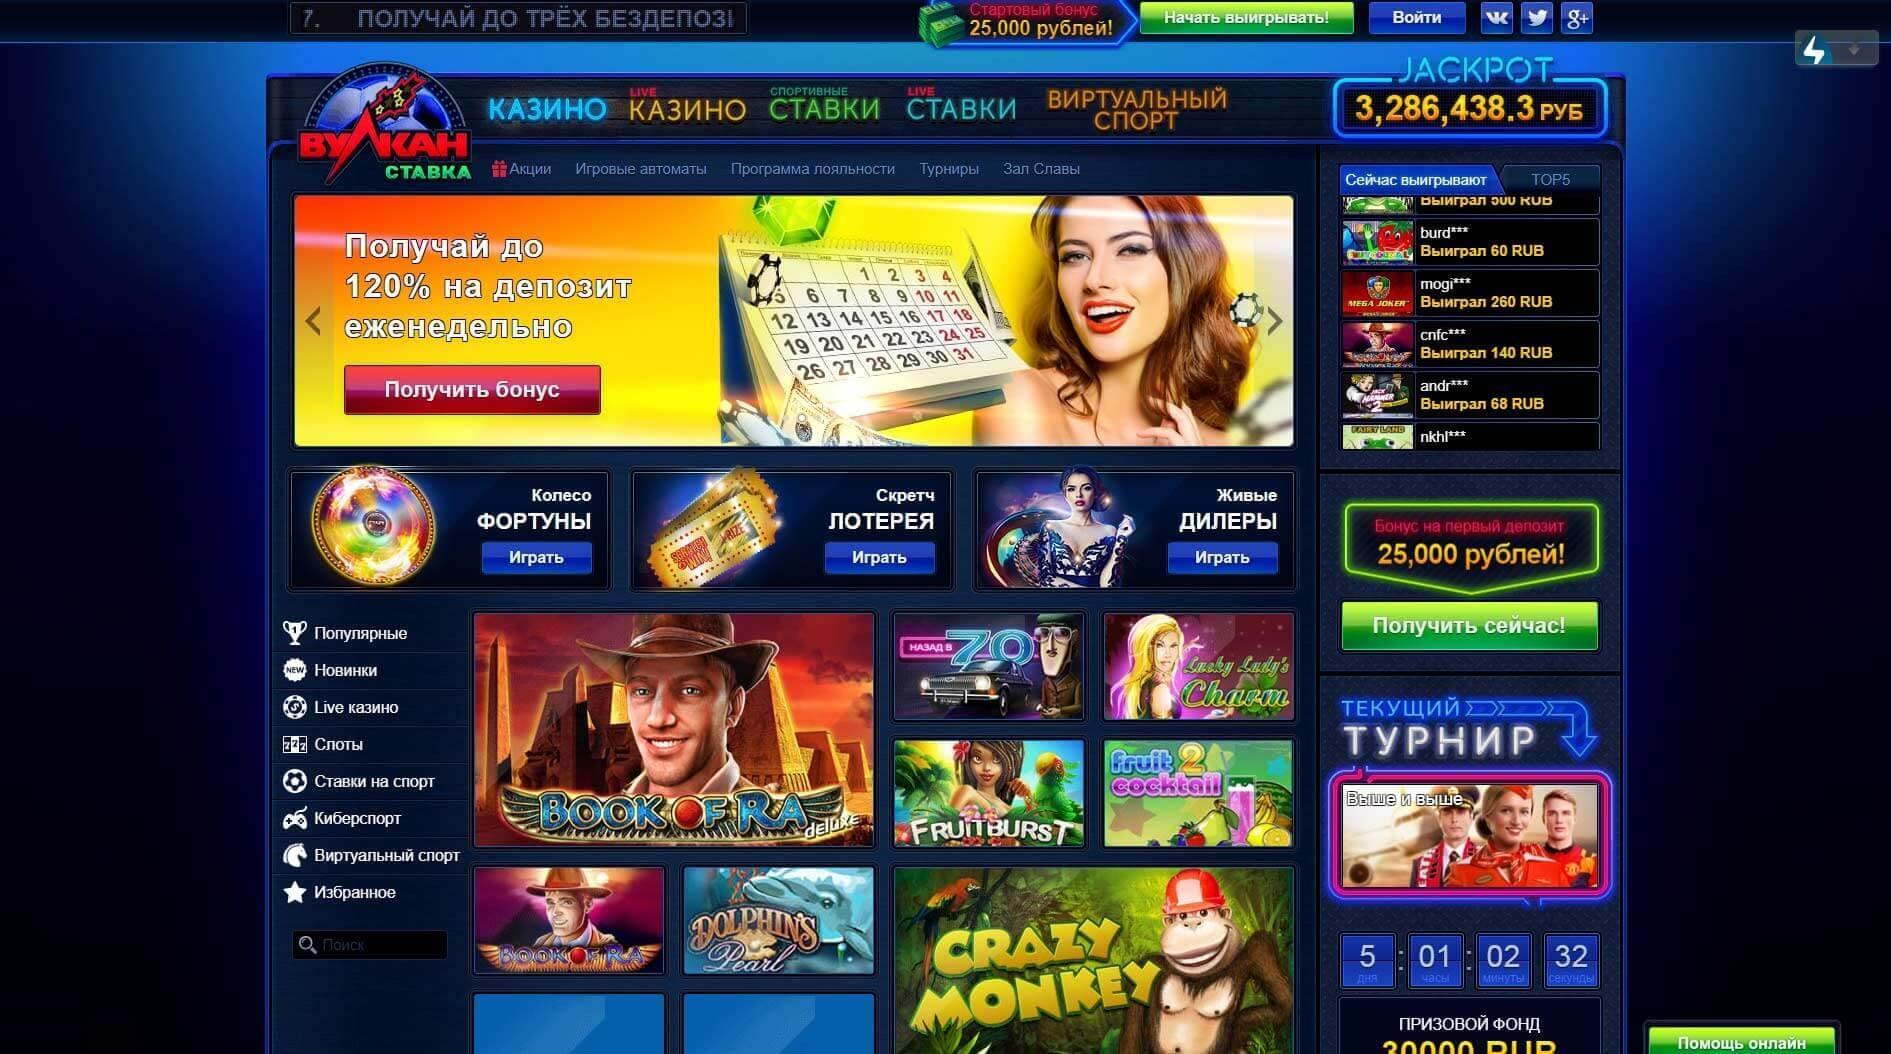 kazino-vulkan-onlayn-zerkalo